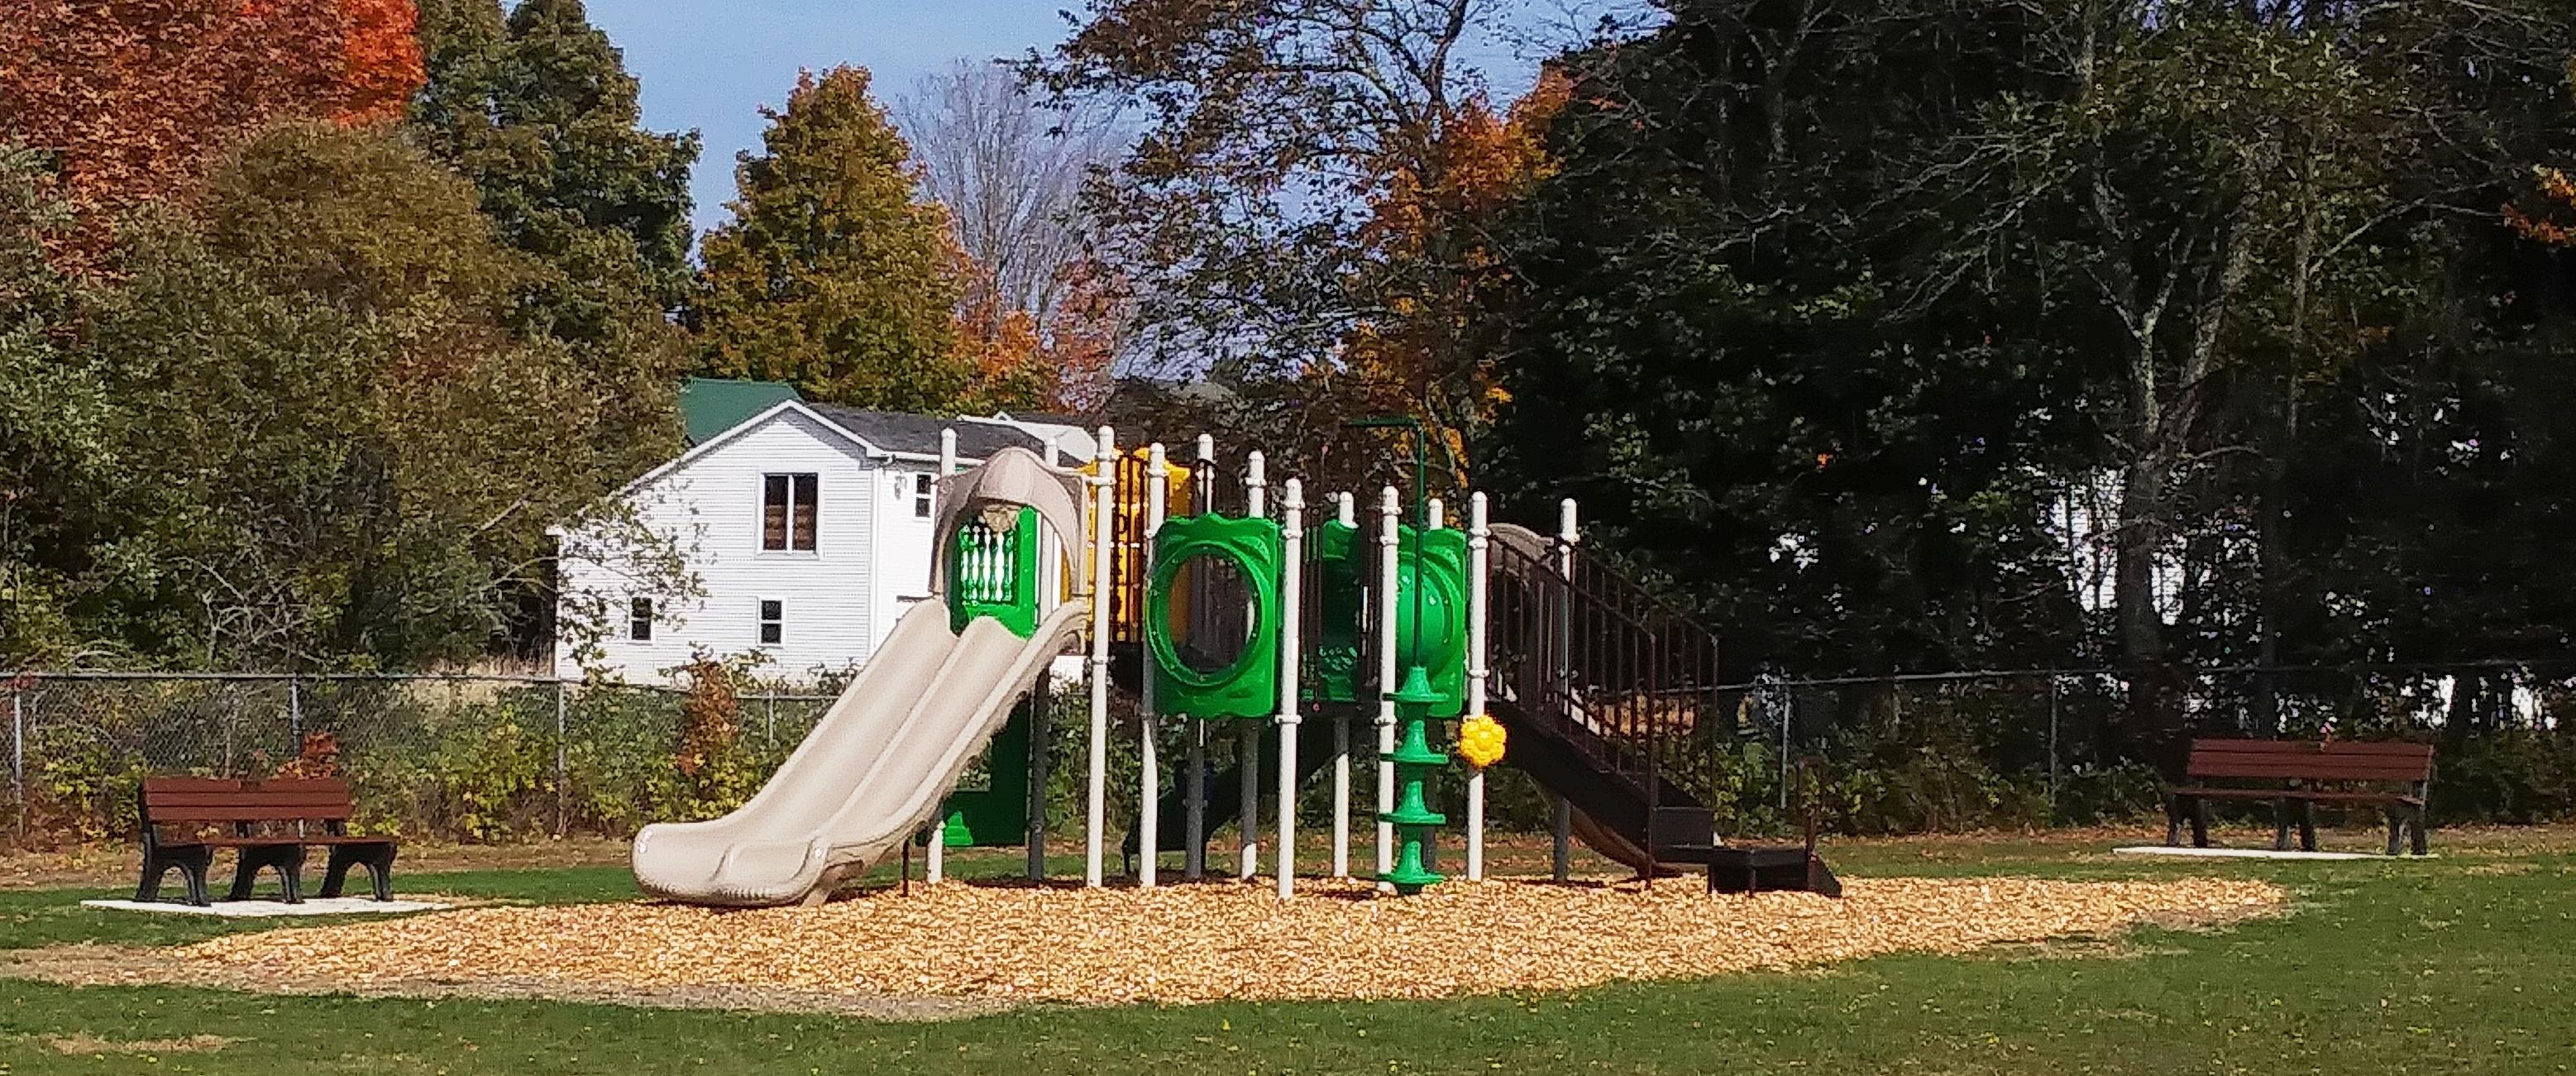 Back Playground Area